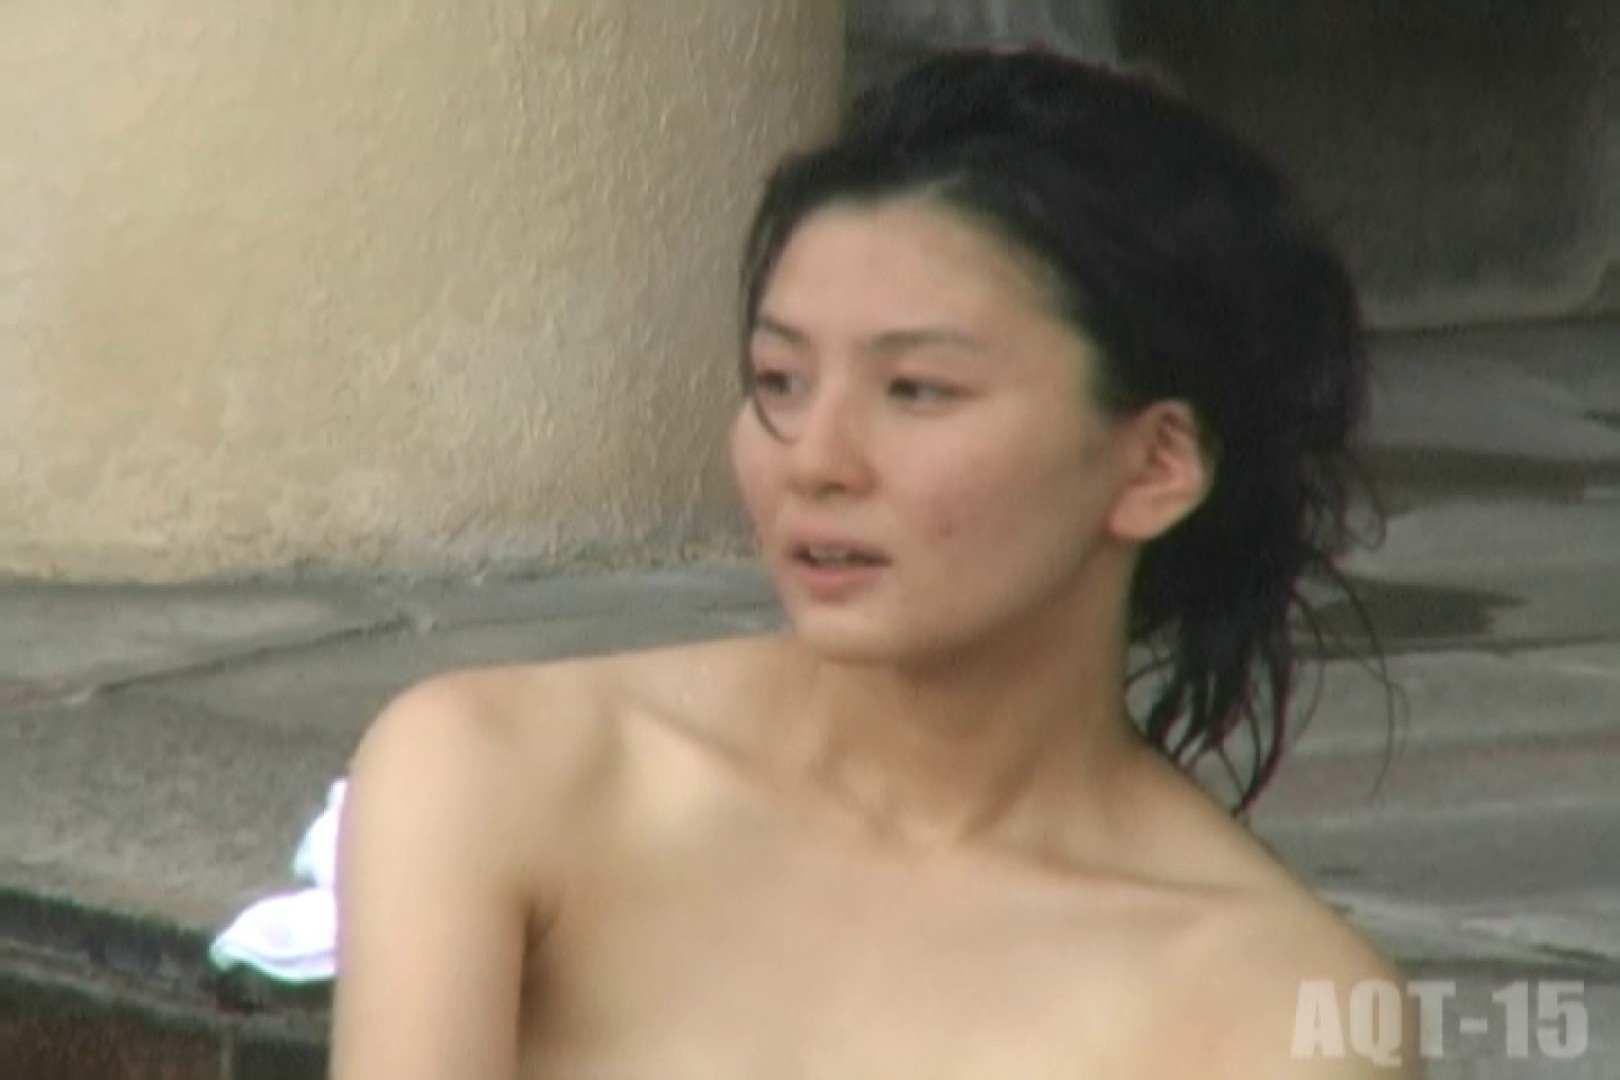 Aquaな露天風呂Vol.832 盗撮映像  99Pix 48